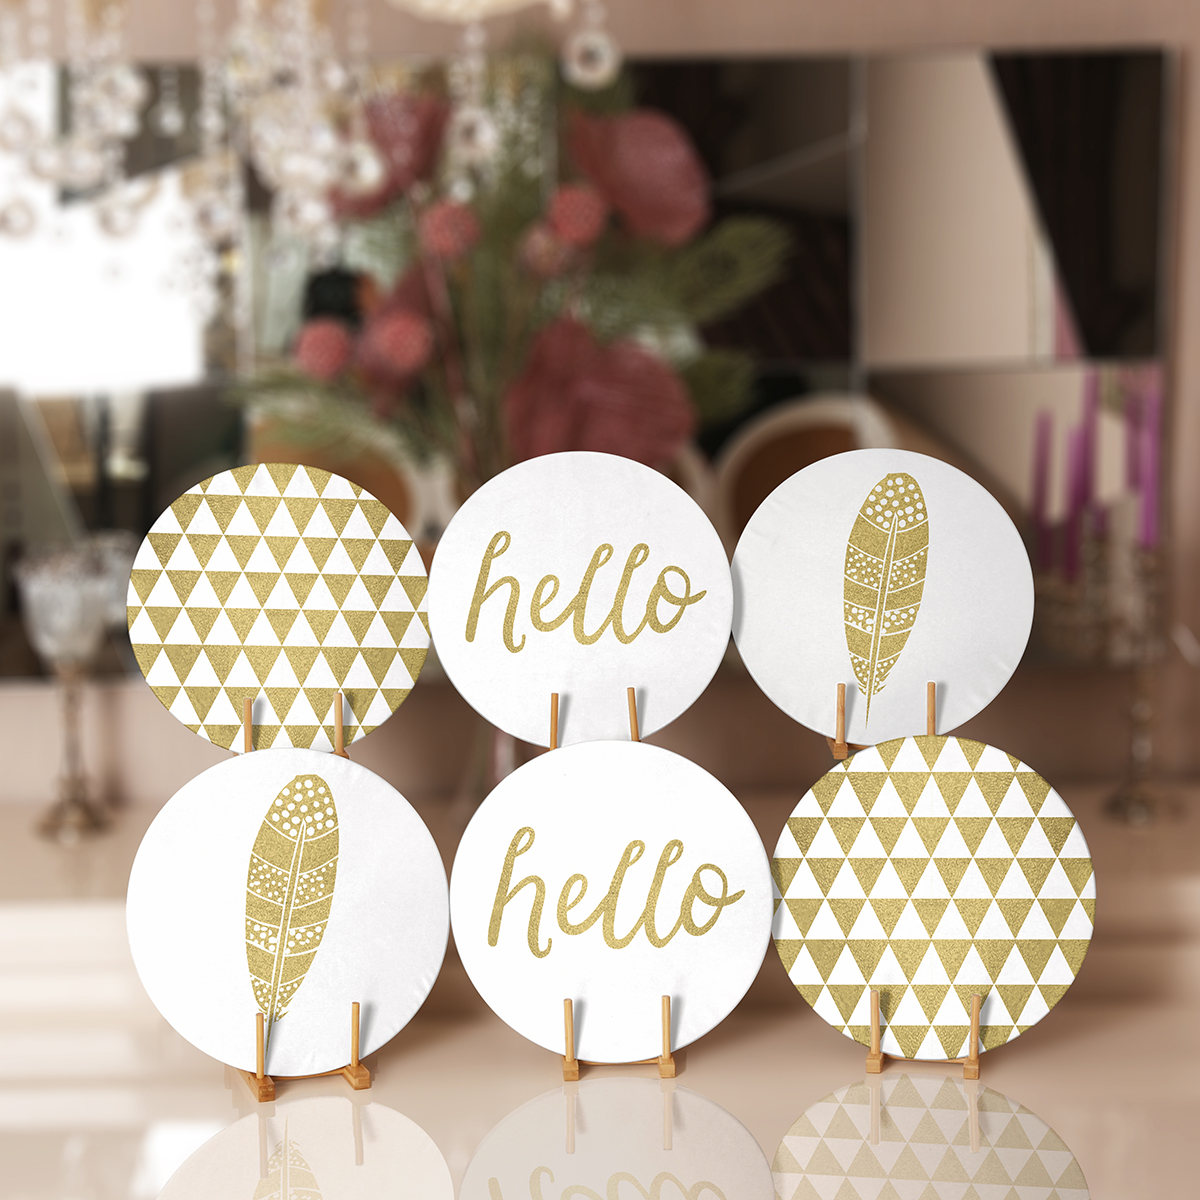 6'lı Gold Desenli Hello Tasarımlı Servis Altlığı & Supla Realhomes